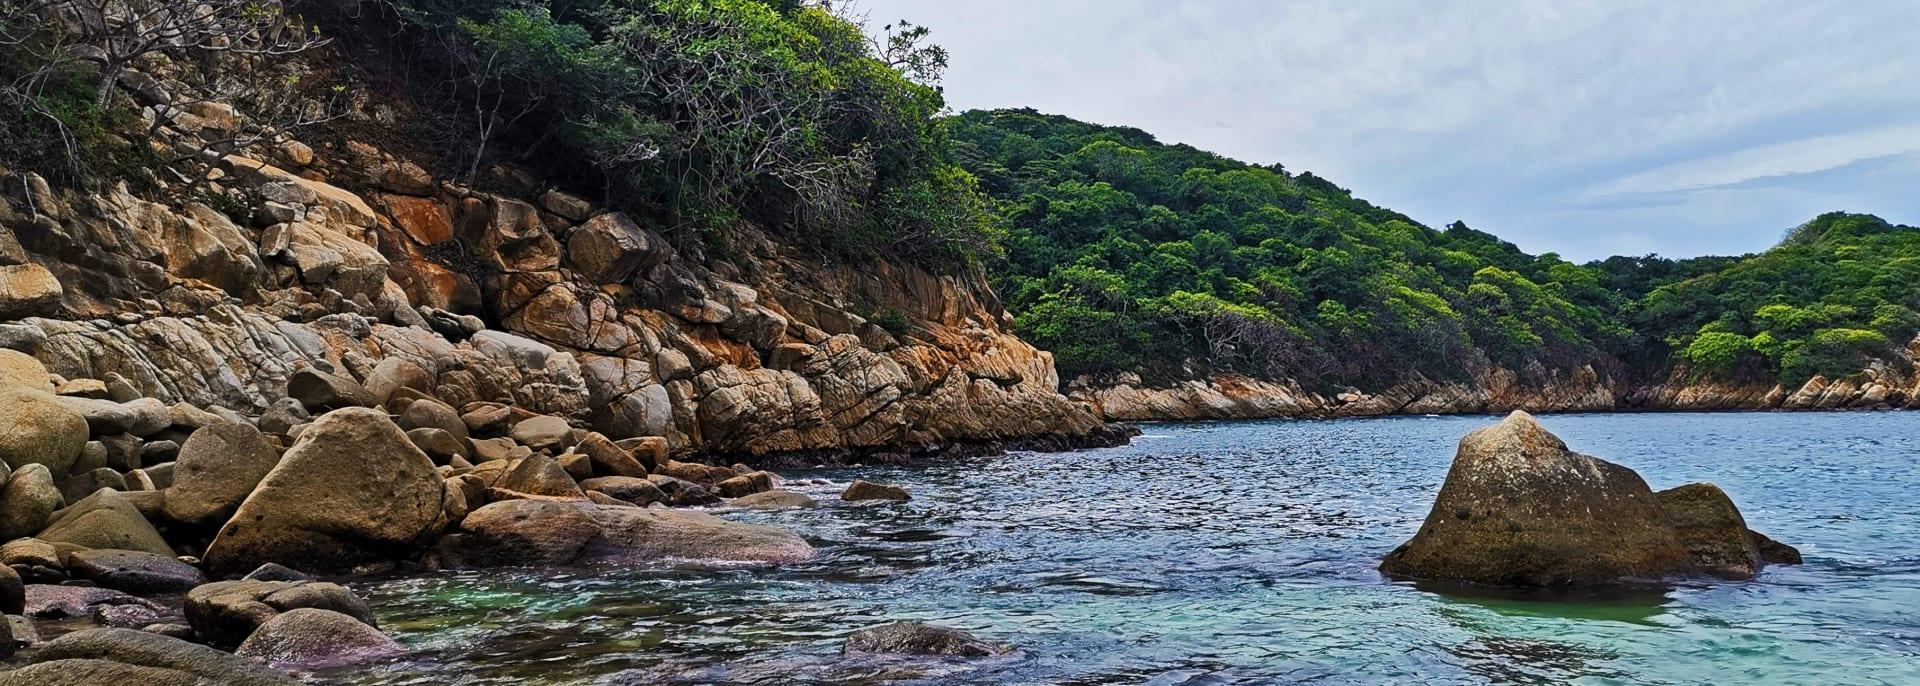 The sea in Acapulco, Mexico